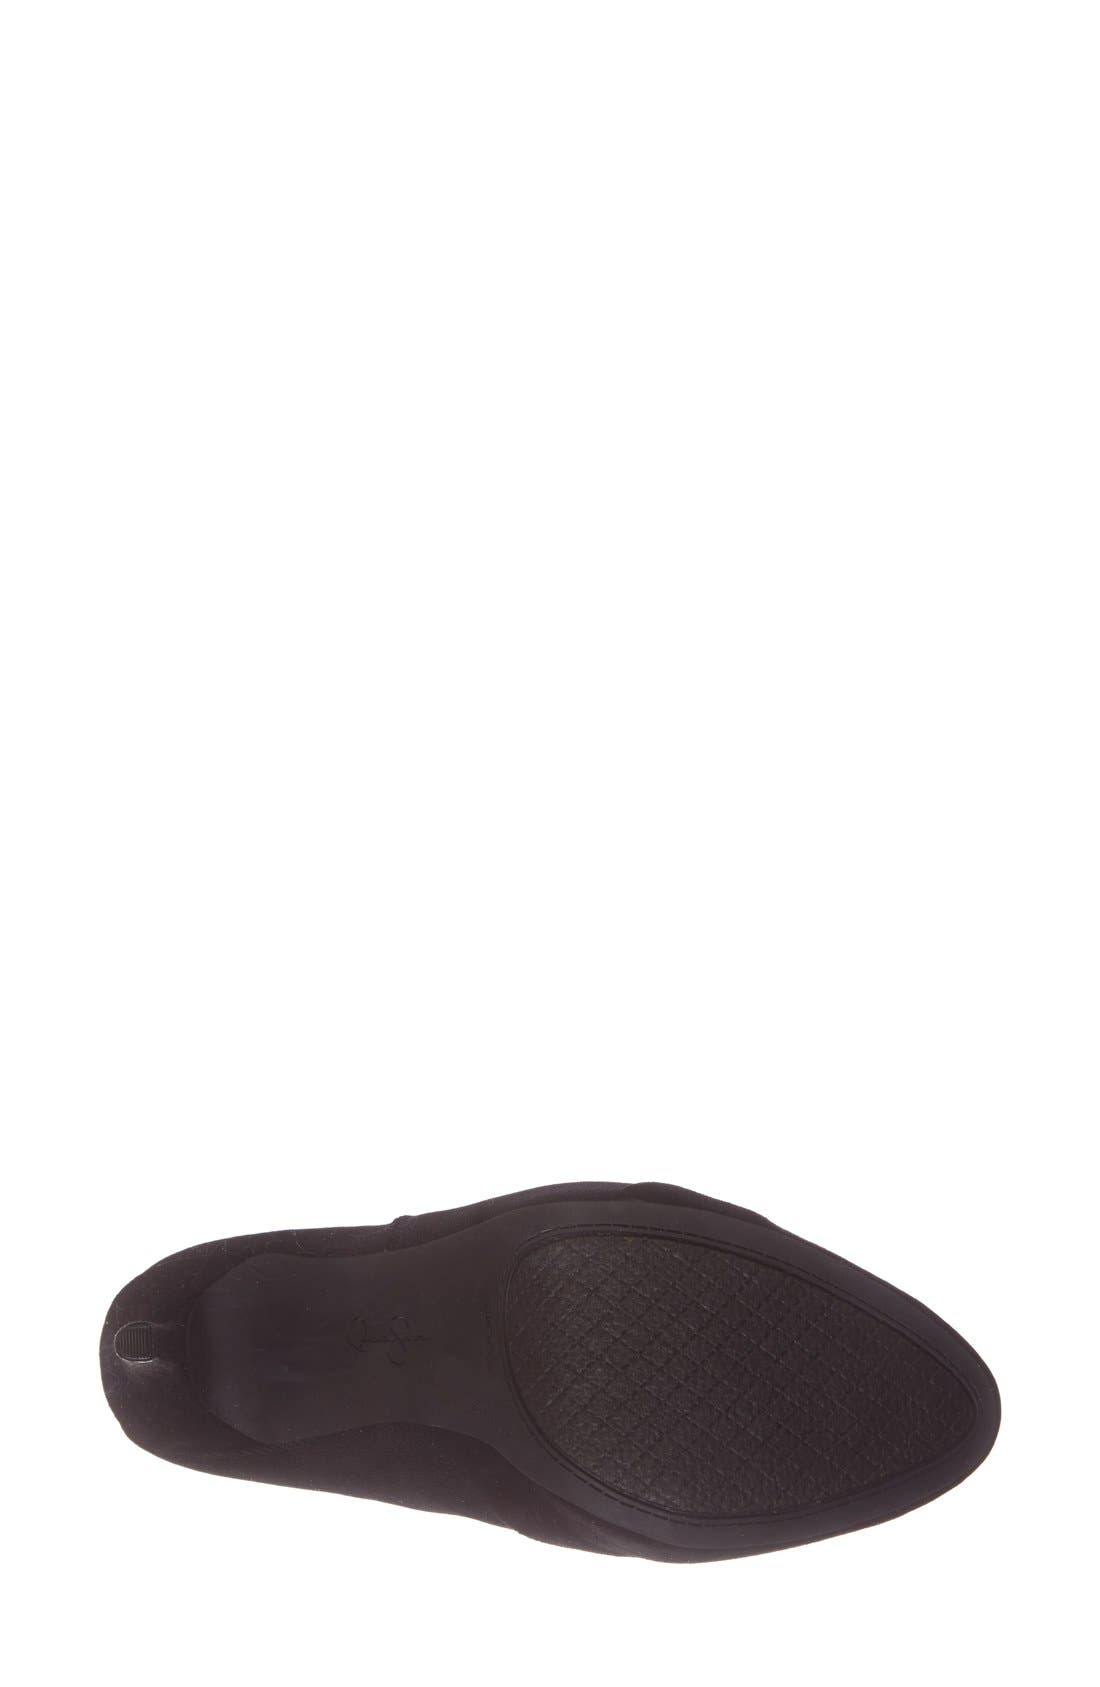 Alternate Image 4  - Jessica Simpson 'Neesha' Stiletto Bootie (Women)